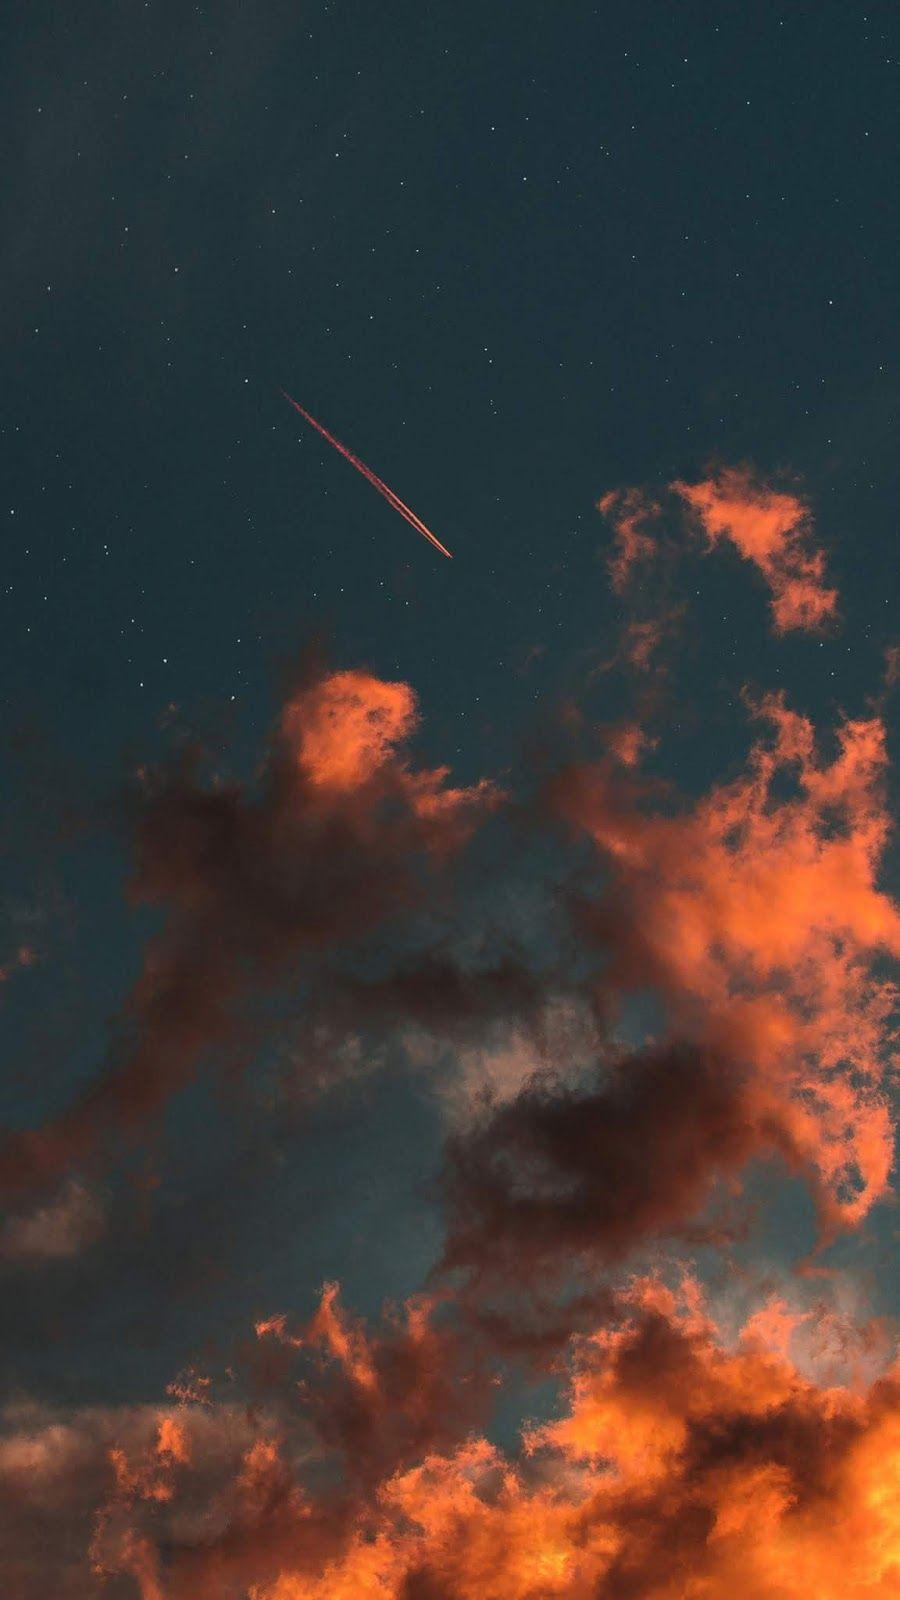 Star fall in the sky